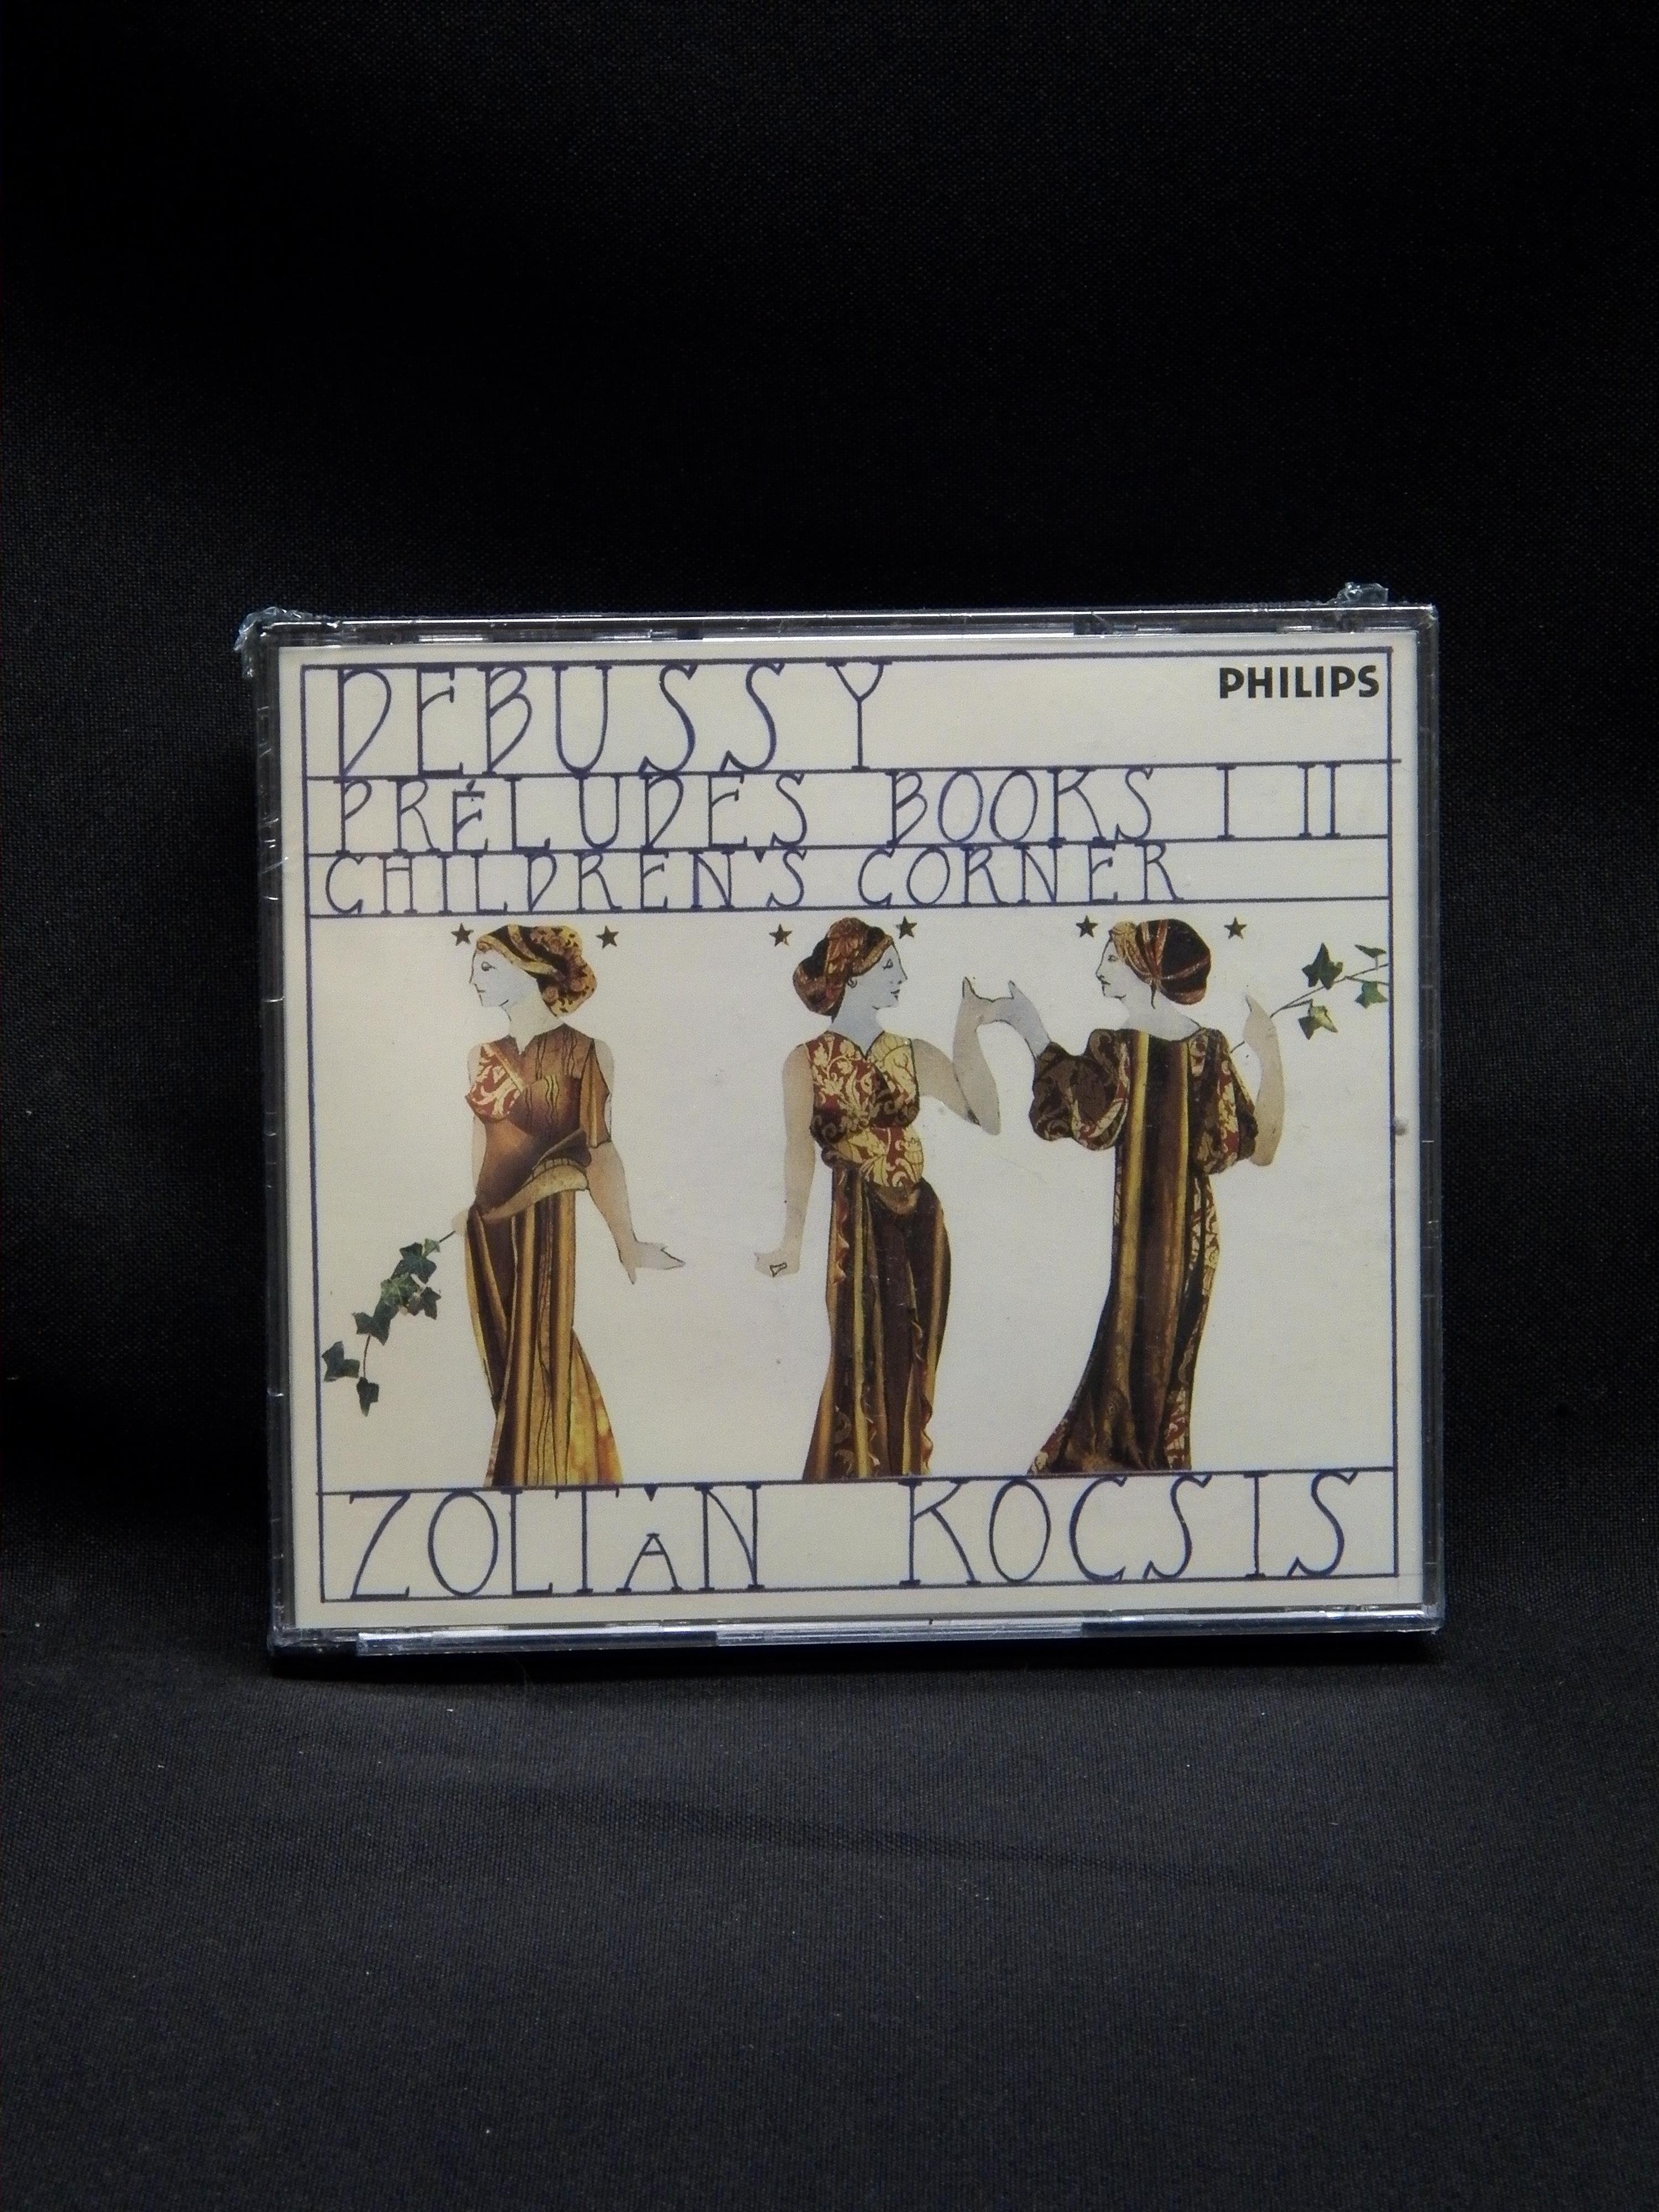 Sealed 2 Cd Set Zoltan Kocsis Debussy Preludes Books I